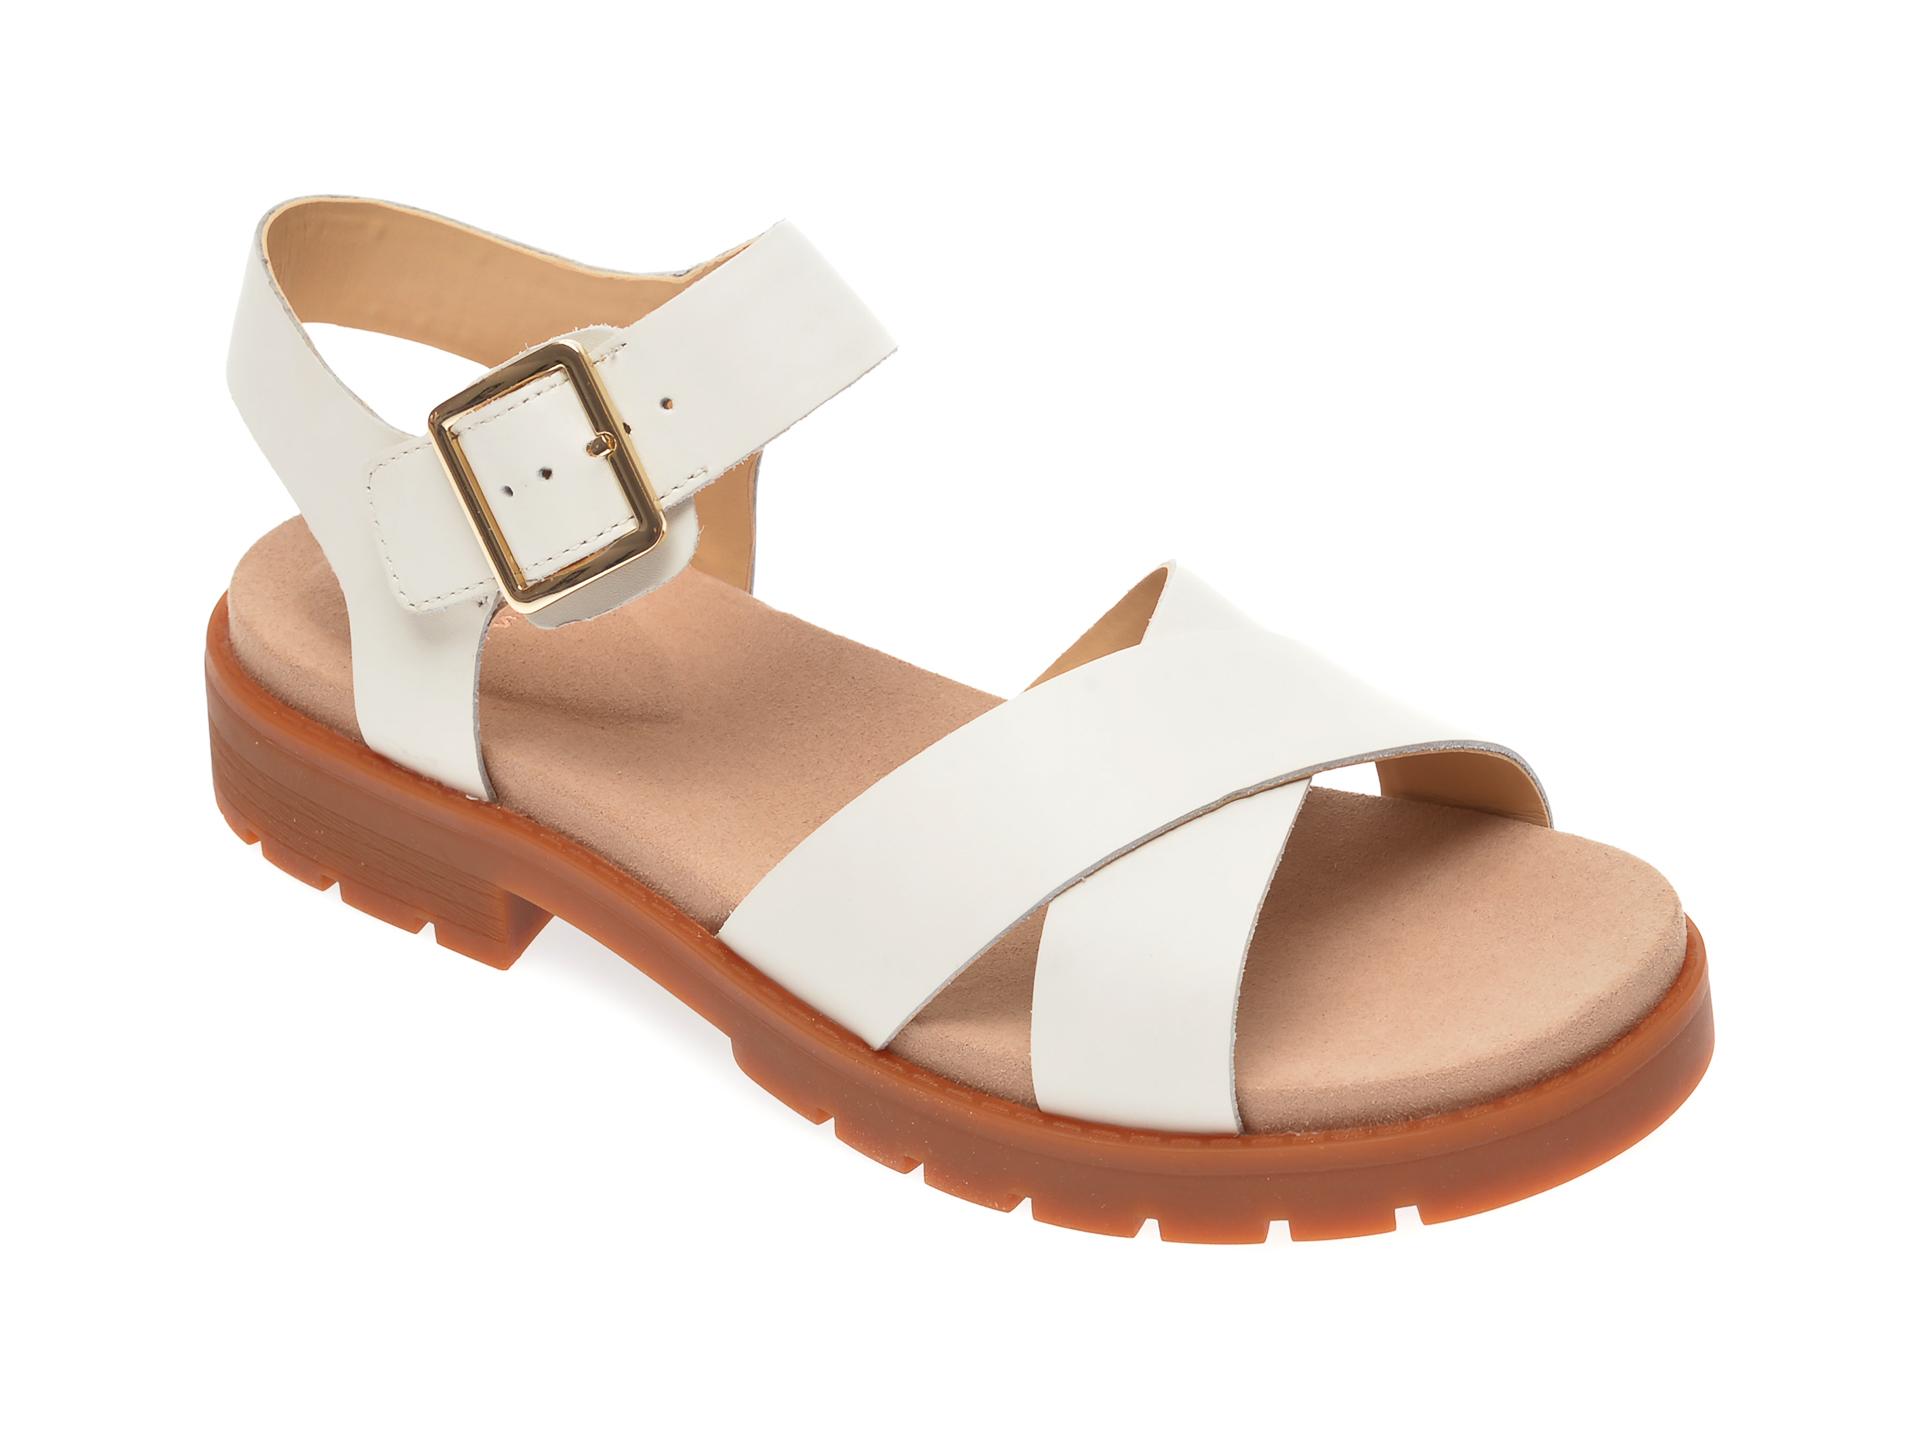 Sandale CLARKS albe, Orinoco Strap, din piele naturala